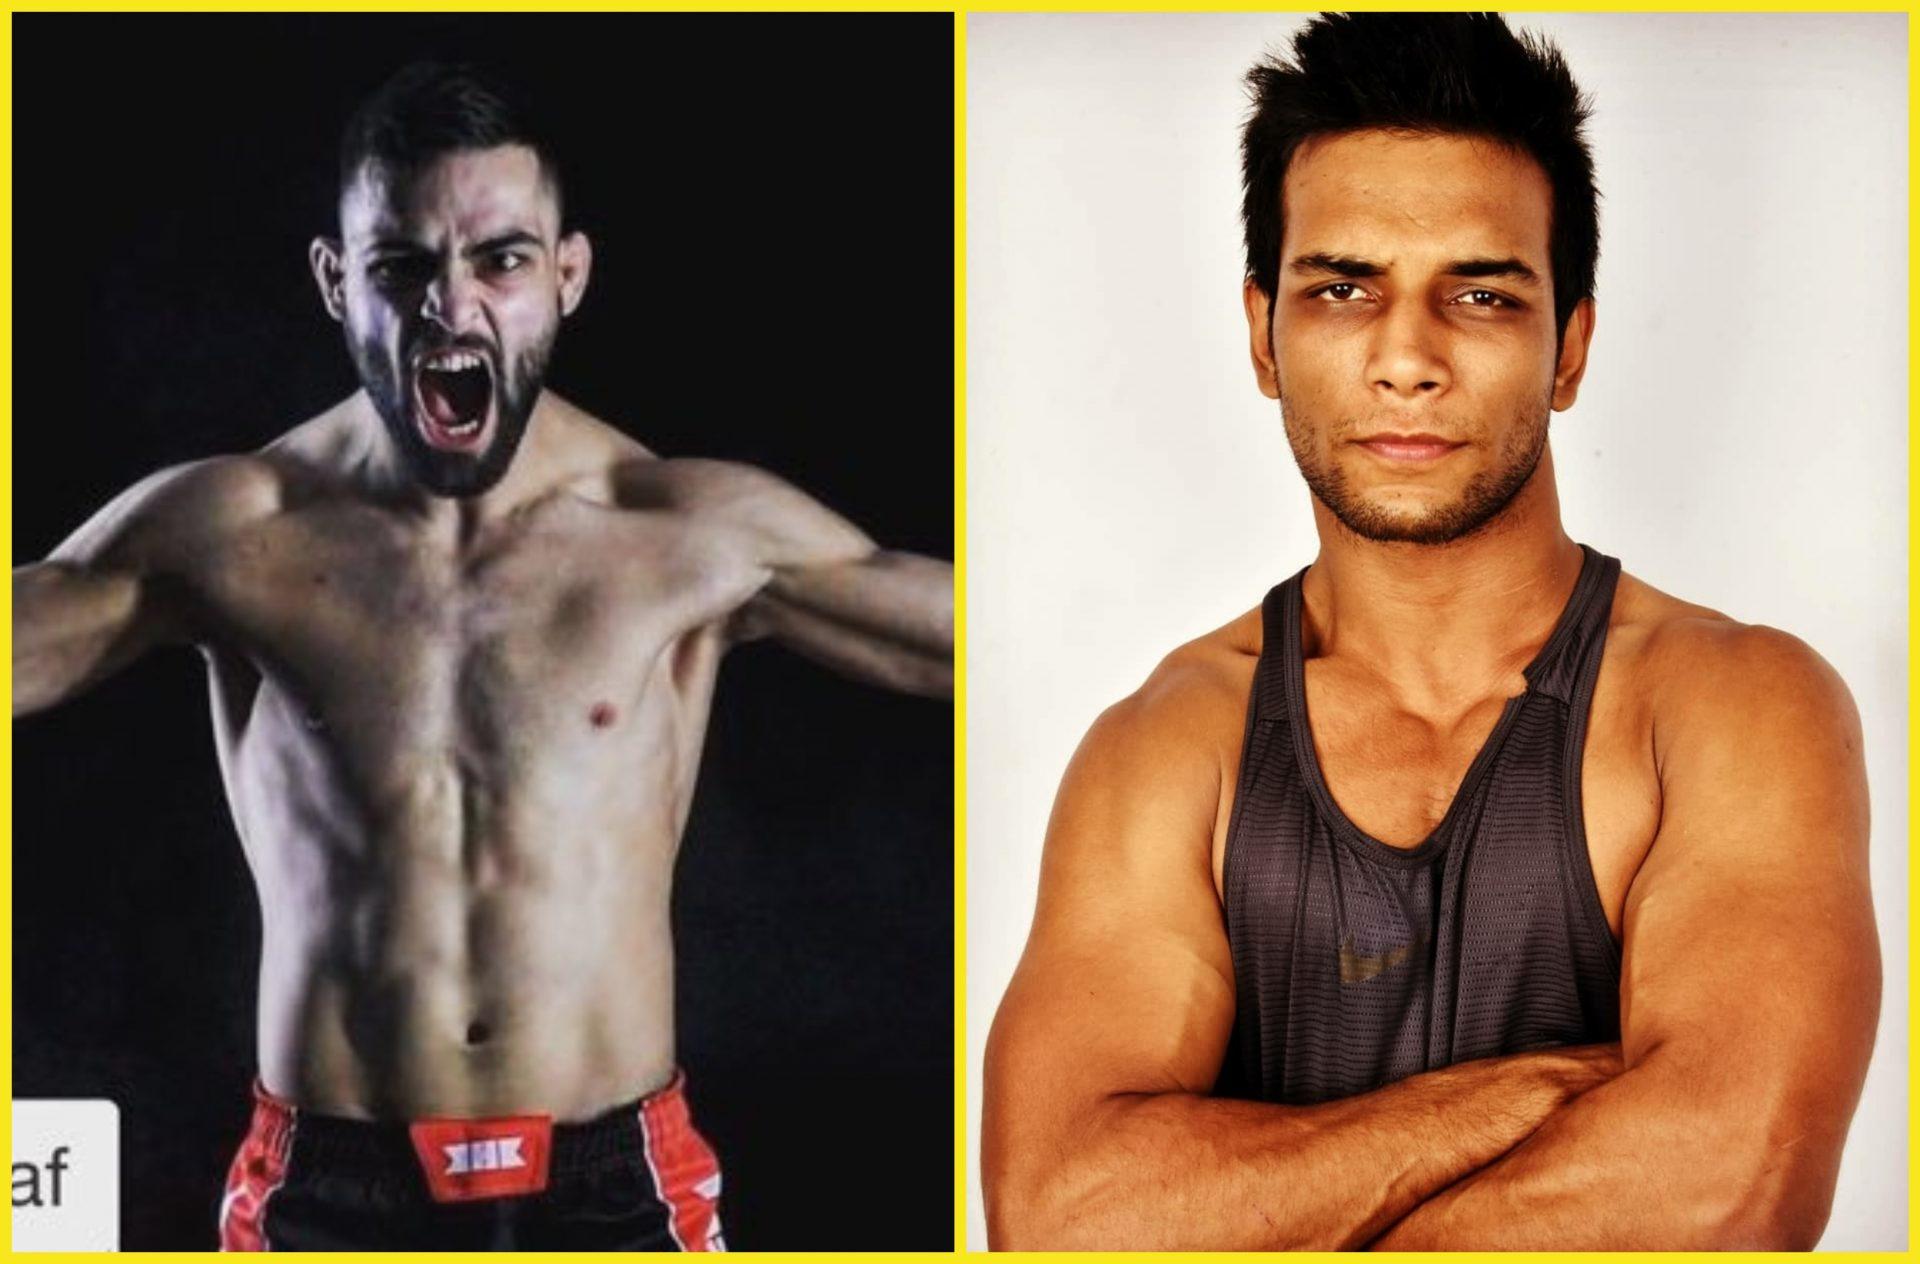 Rana Rudra Pratap Singh responds to 'Chaiwala' jibe from Pakistani MMA fighter Mehmosh Raza - Rudra Pratap Singh